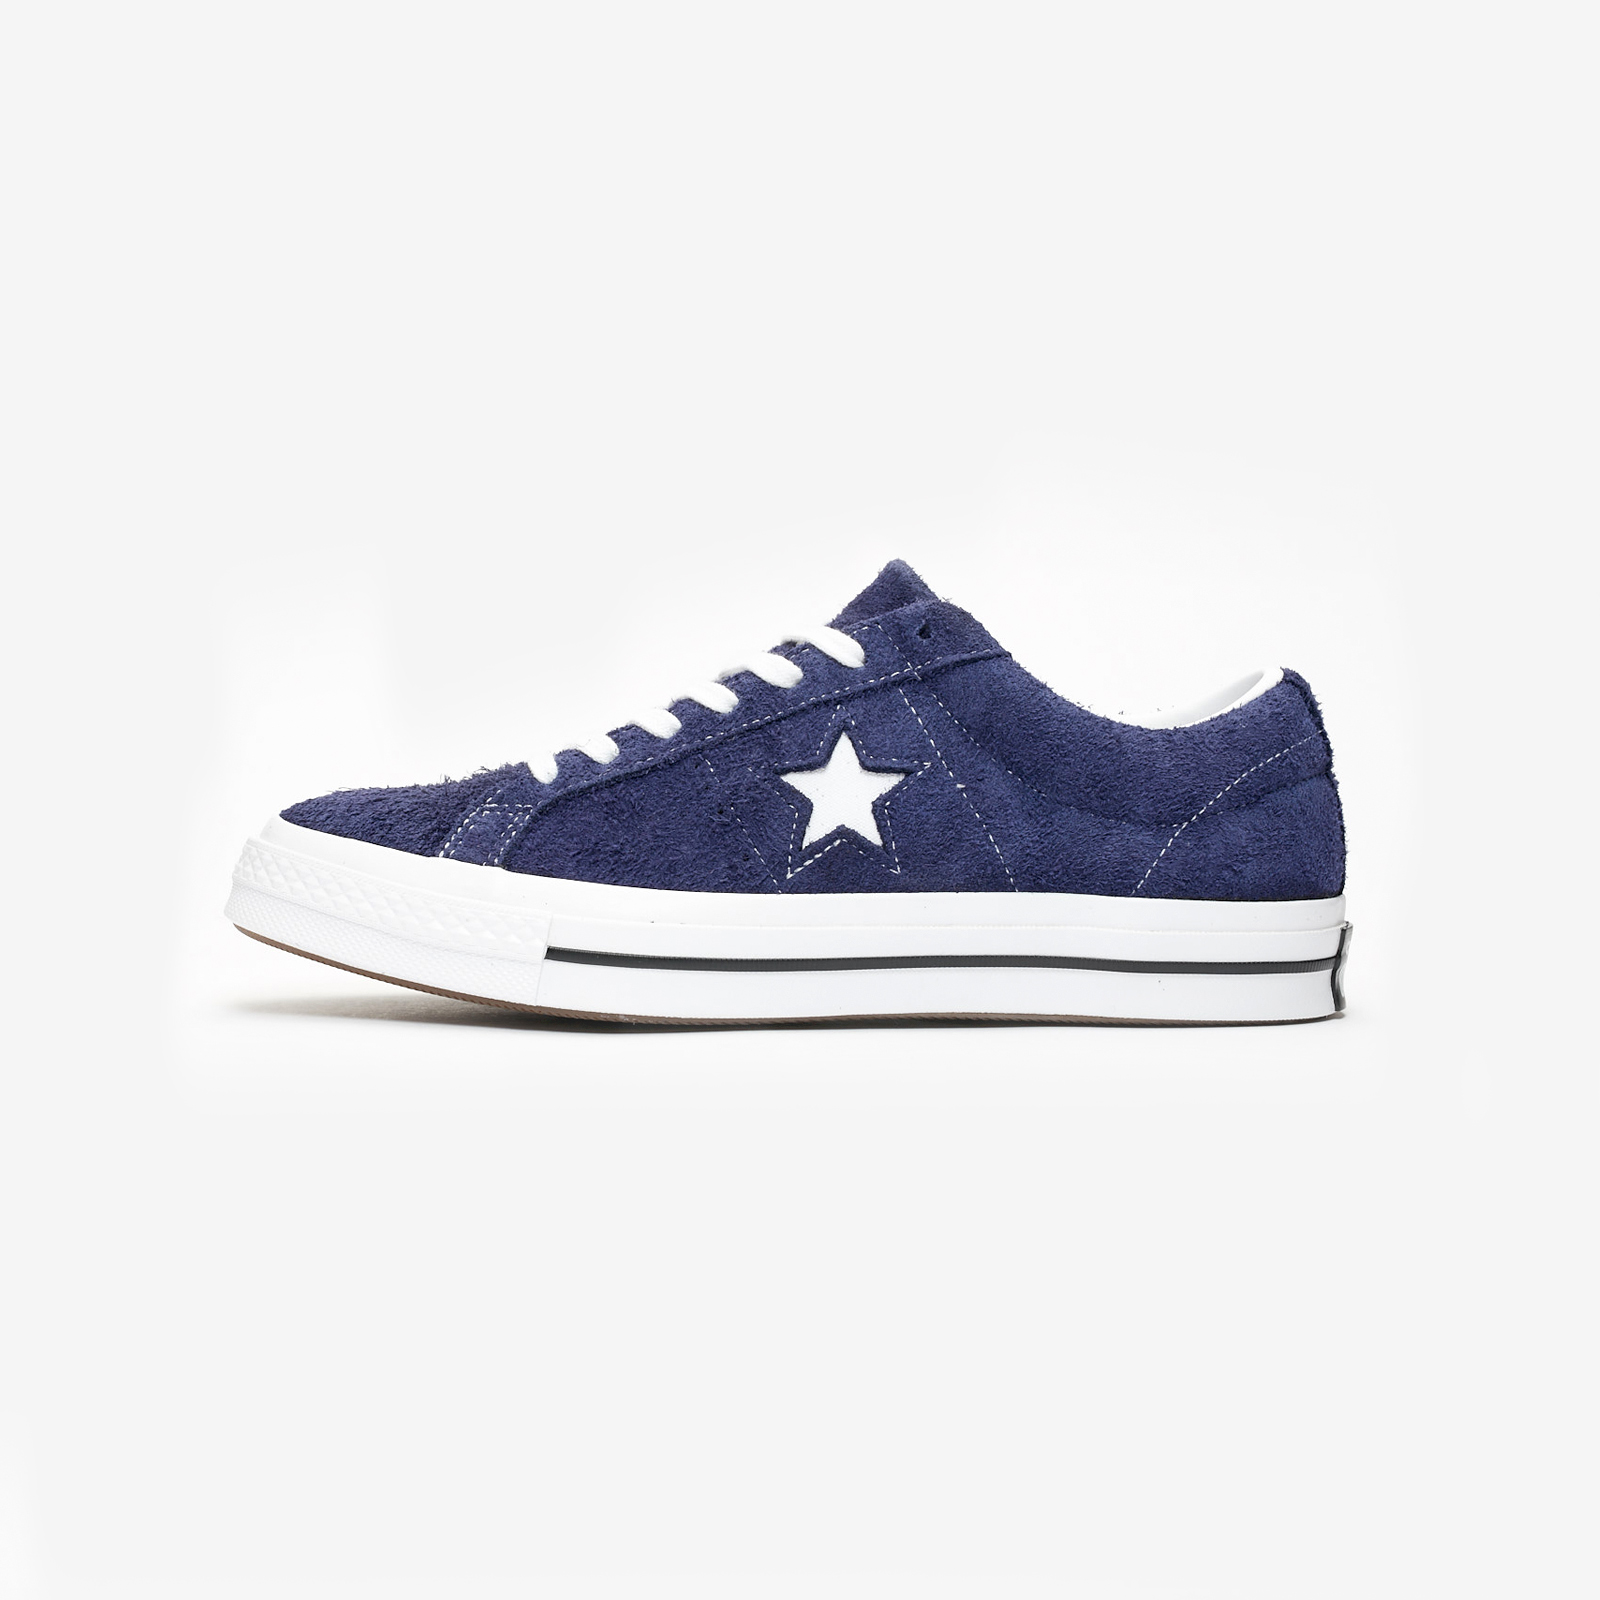 Converse One Star Ox 162576c Sneakersnstuff | sneakers